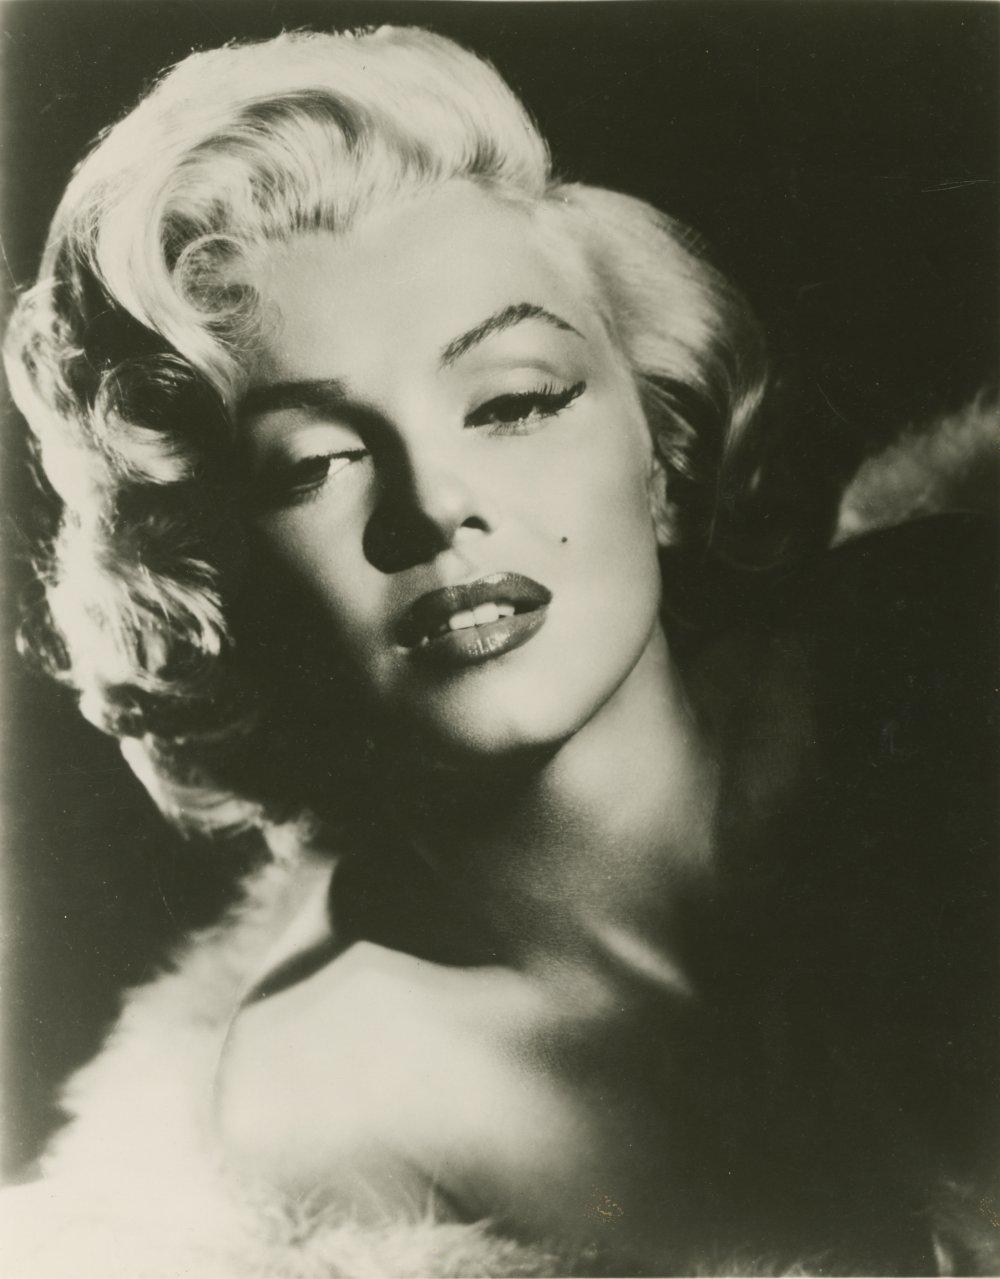 Glamour photo by Milton H. Greene